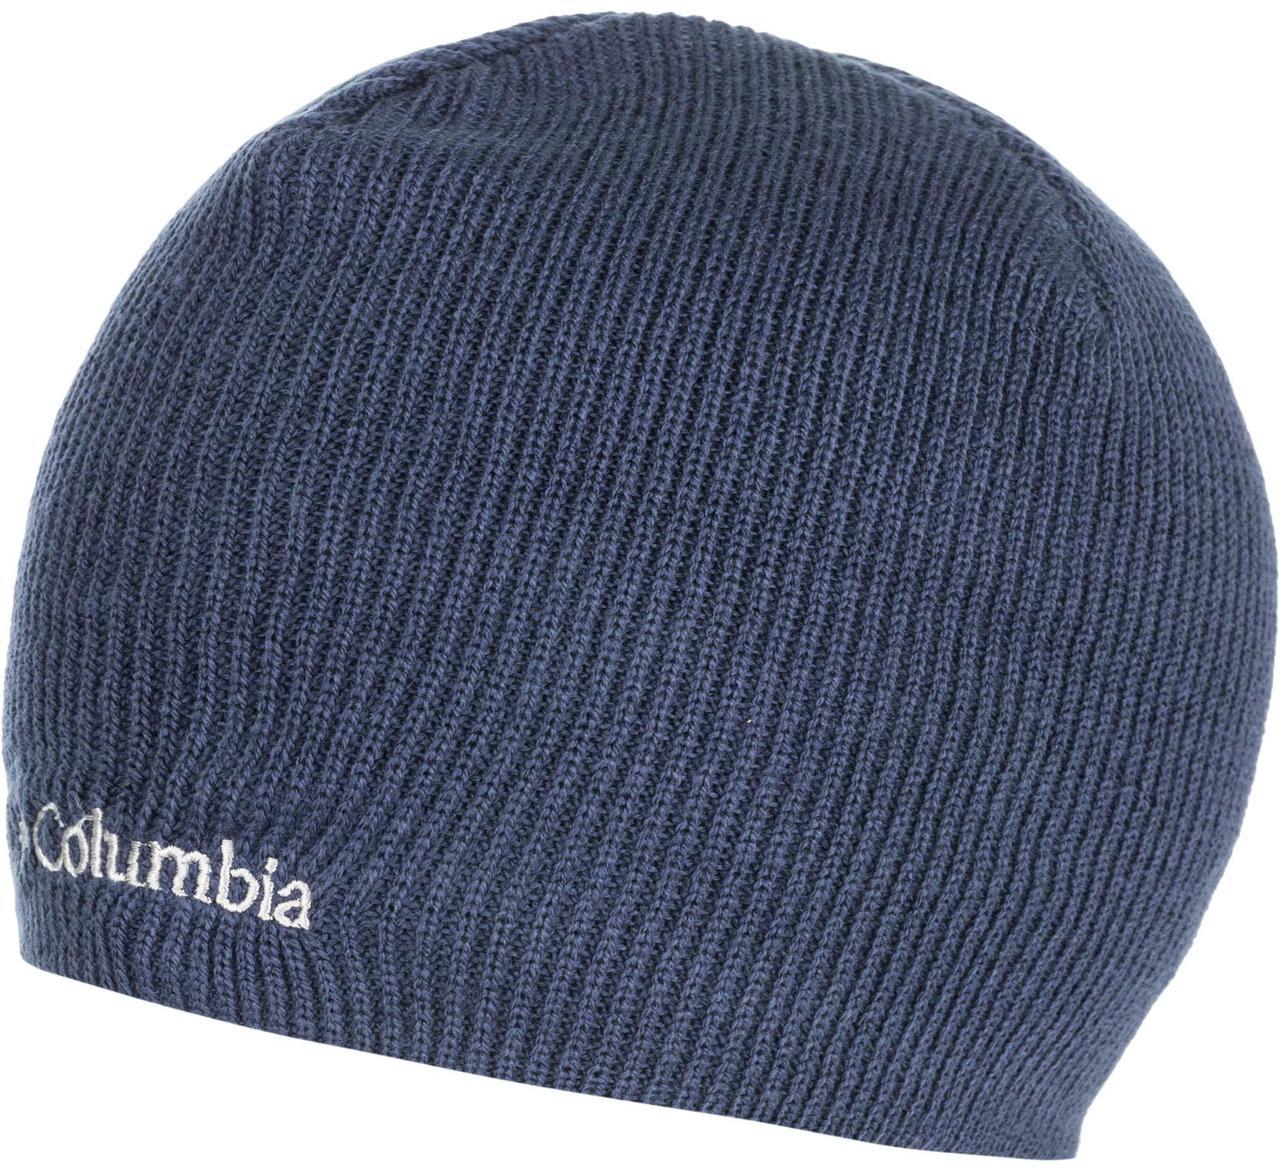 ШАПКА COLUMBIA  WHIRLIBIRD WATCH CAP™ (CU9309-464)